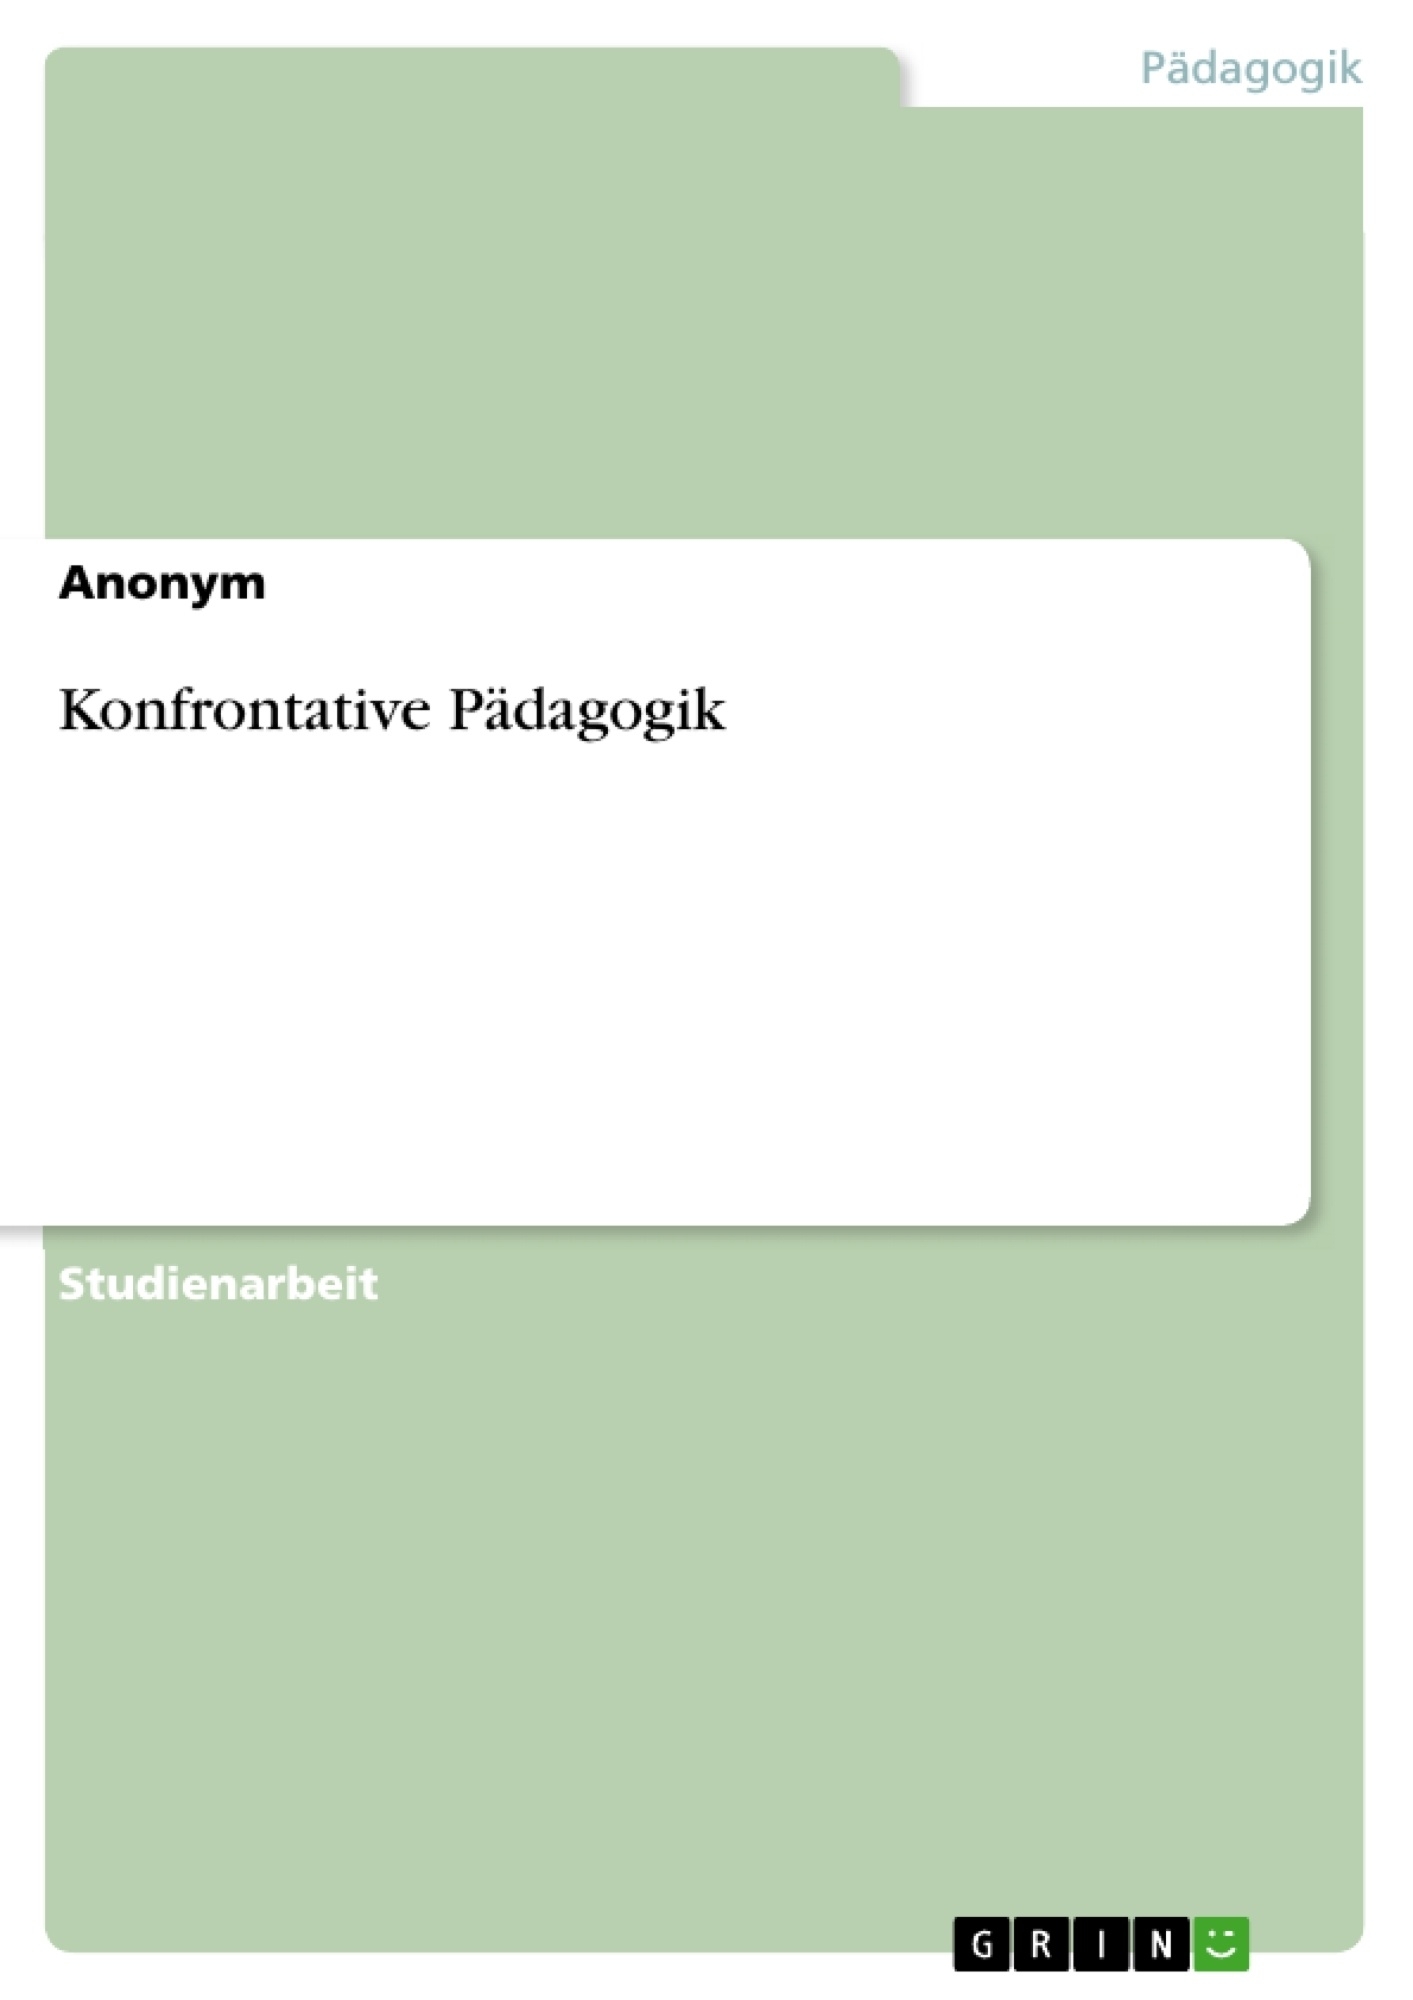 Titel: Konfrontative Pädagogik